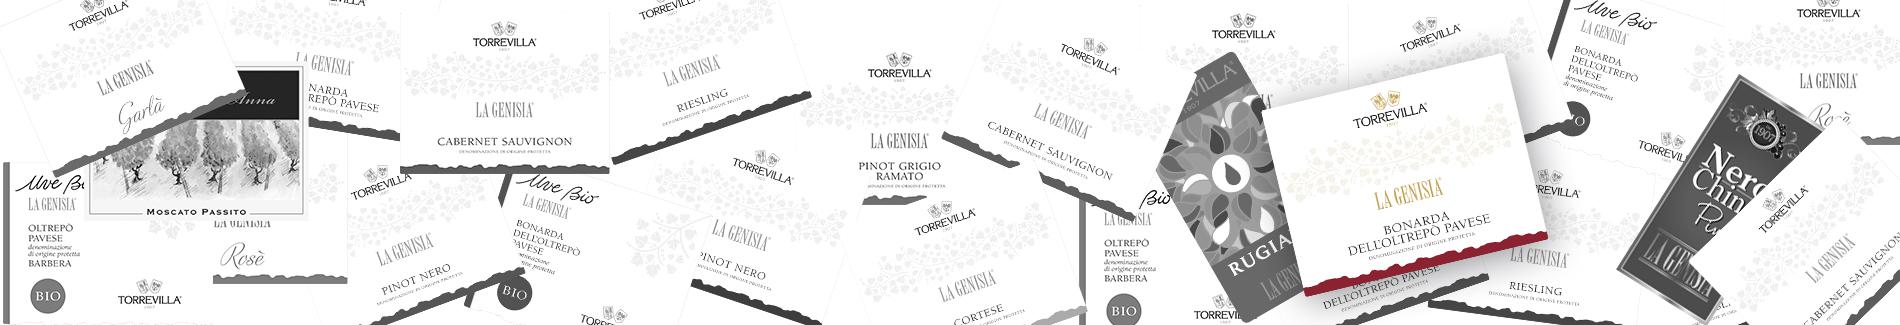 Bonarda dell'Oltrepò Pavese La Genisia